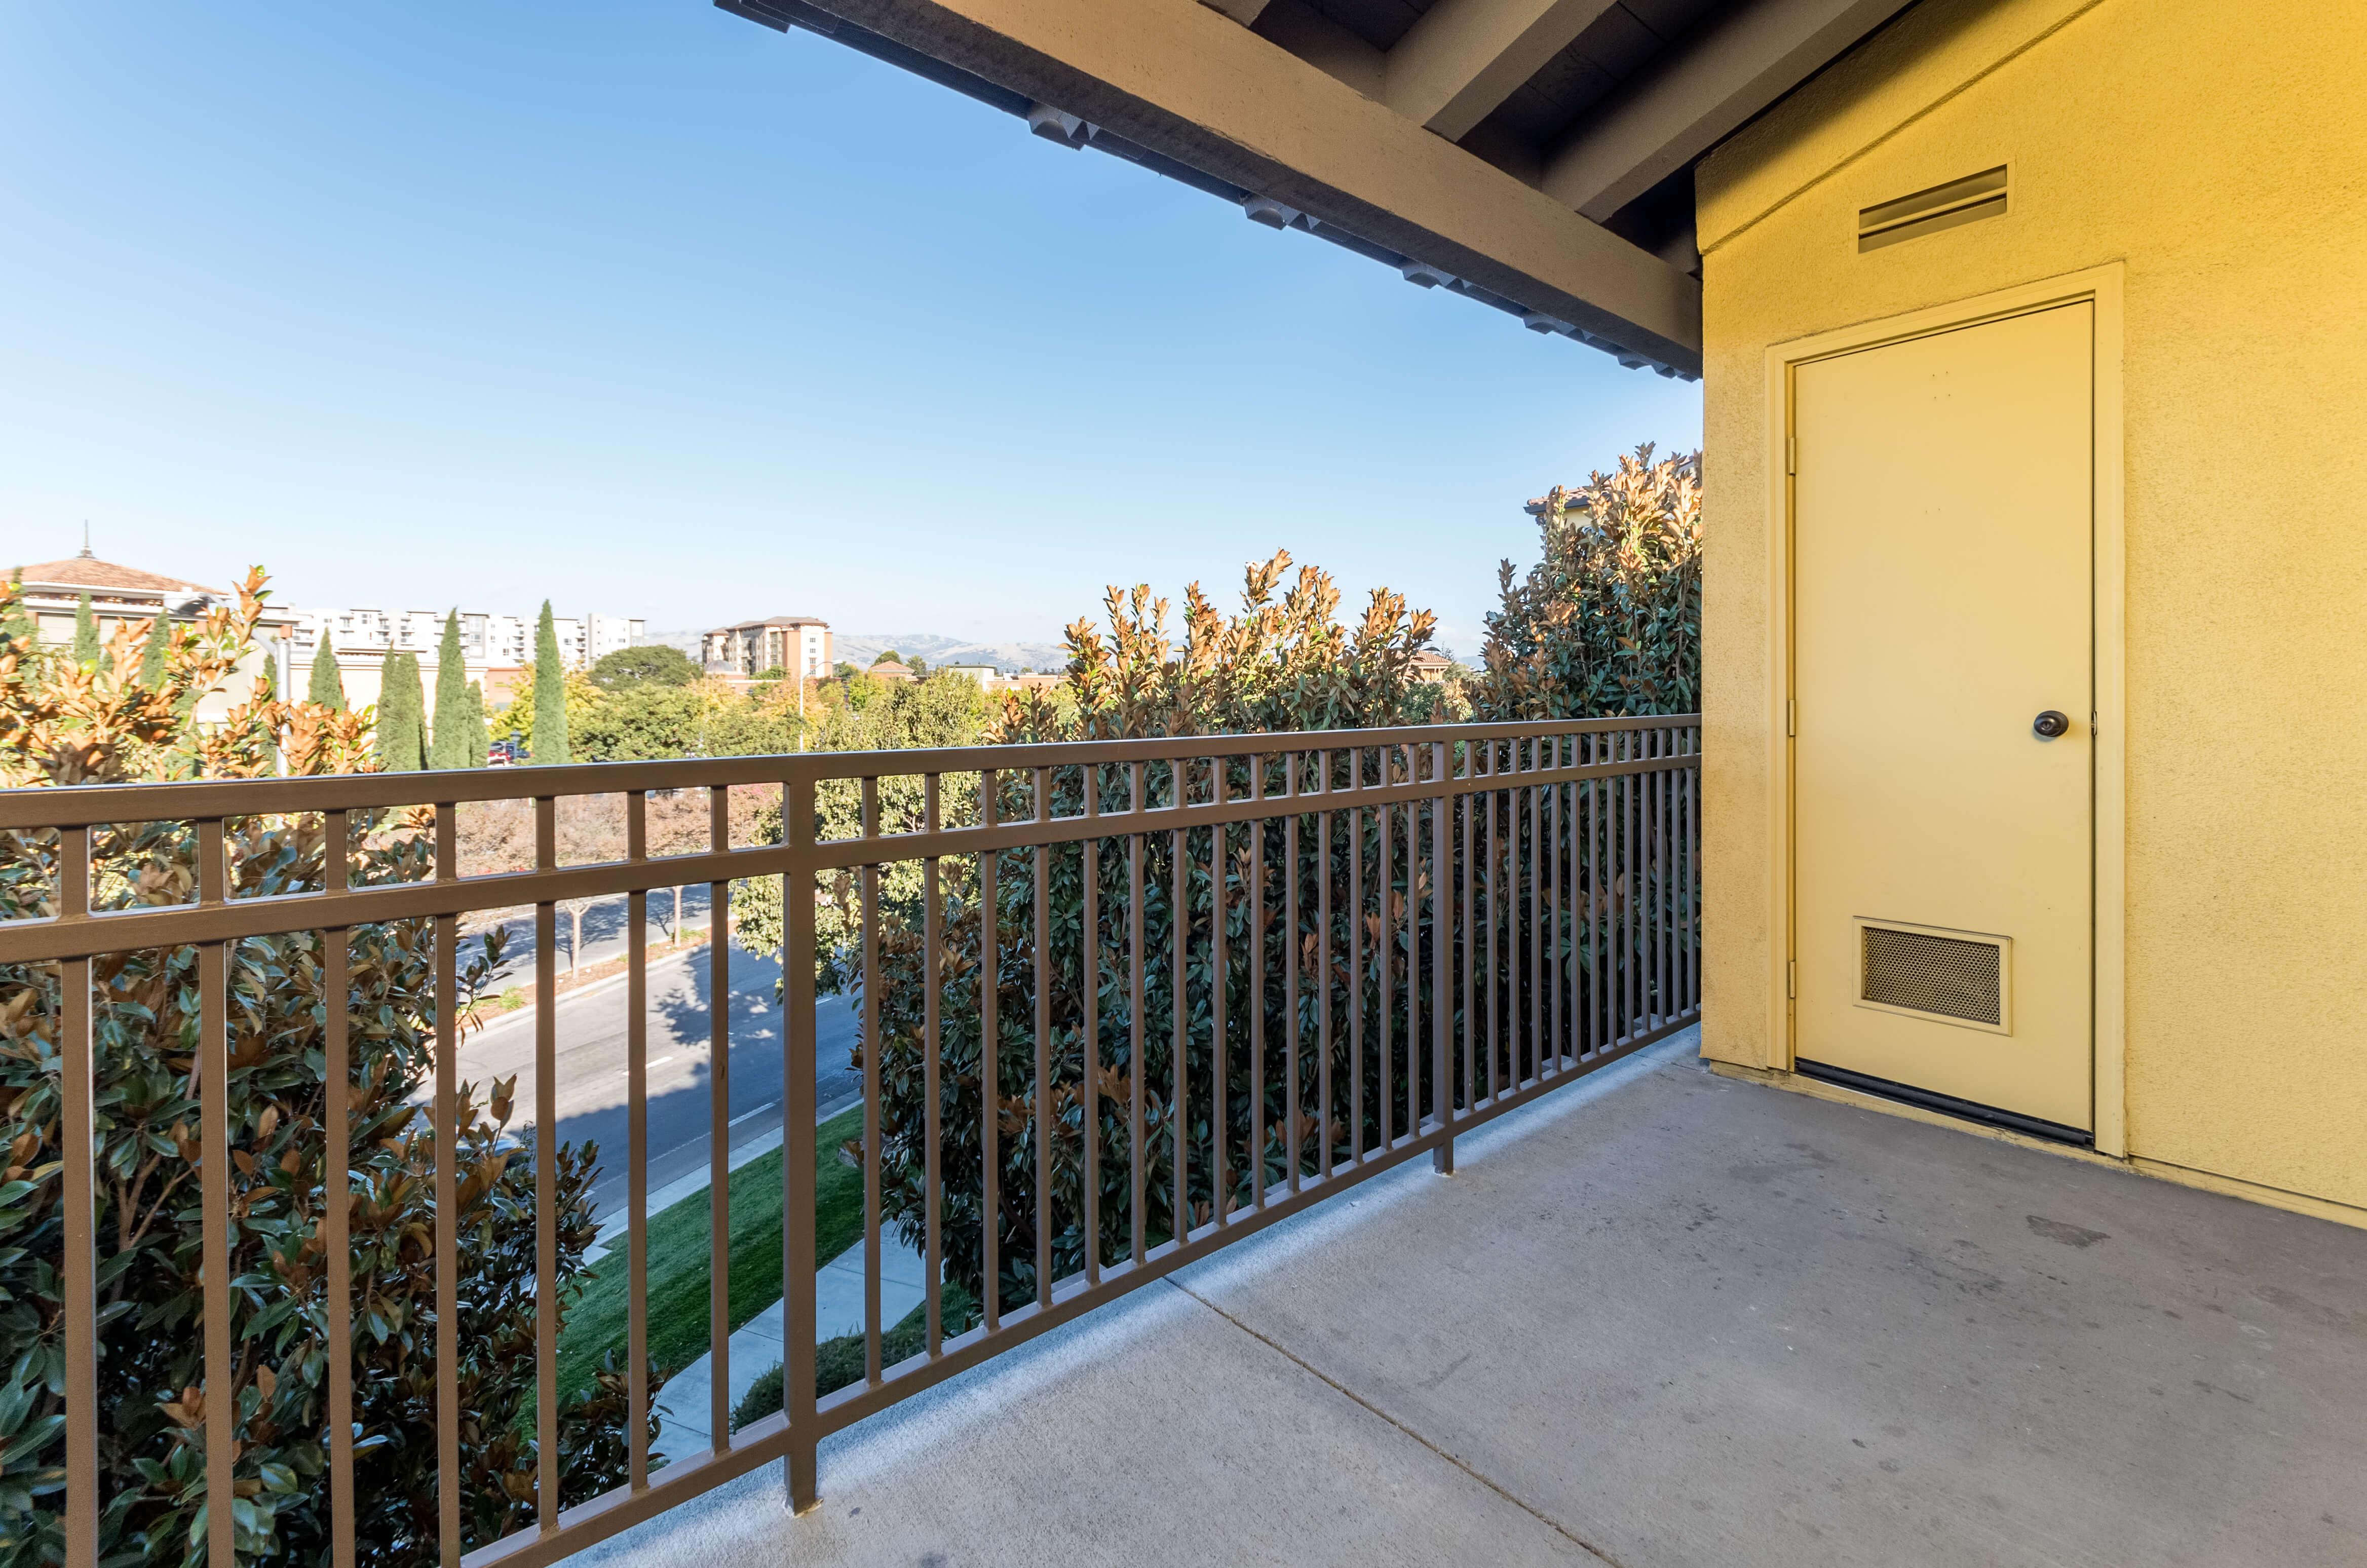 image 9 furnished 3 bedroom Apartment for rent in Santa Clara, Santa Clara County